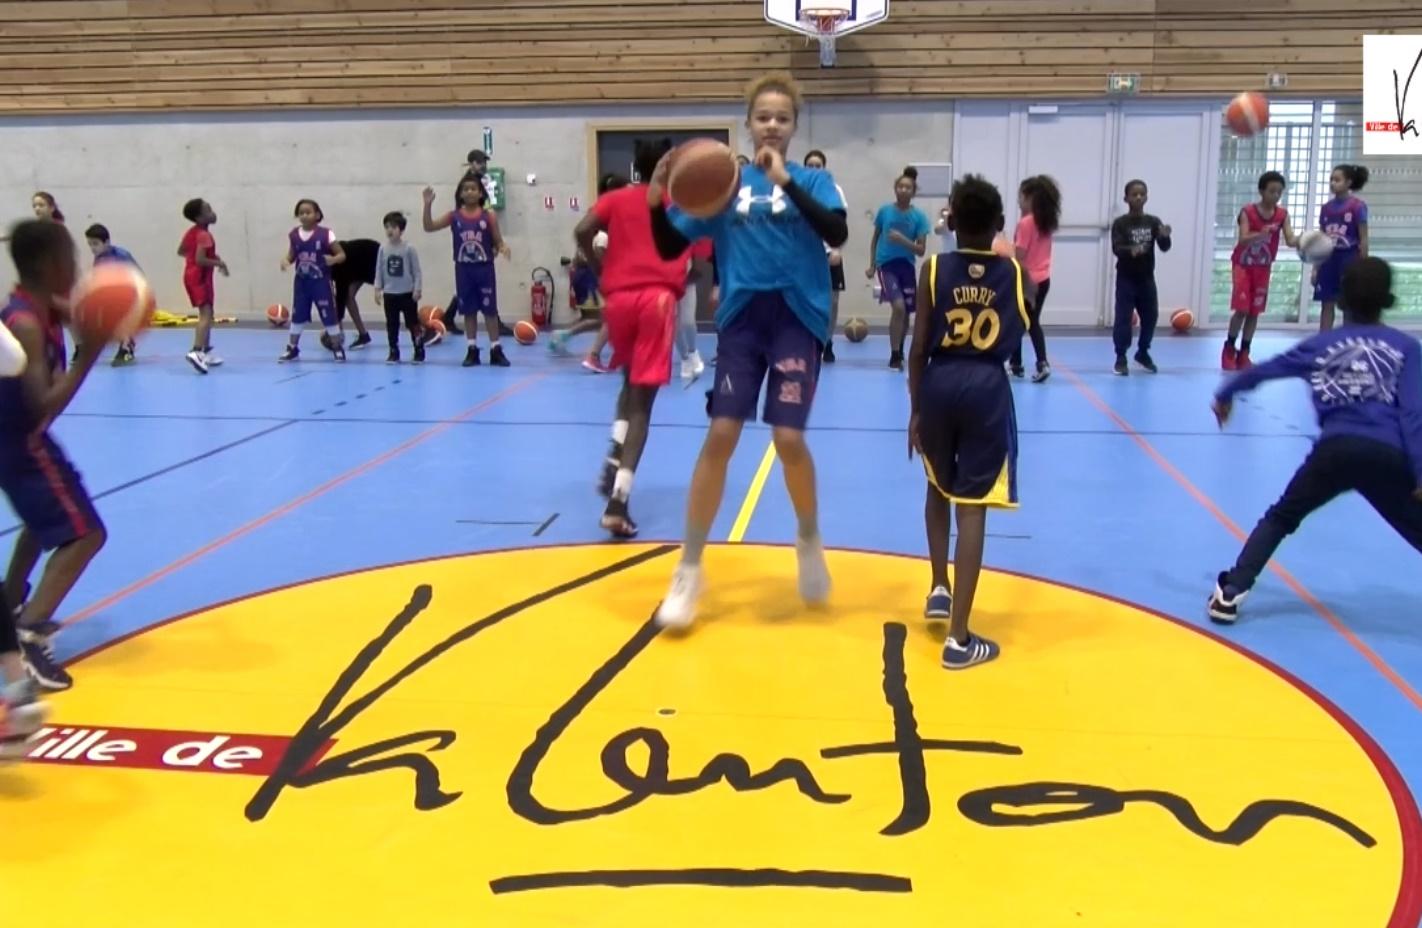 Génération Basket au gymnase Gérard-Roussel